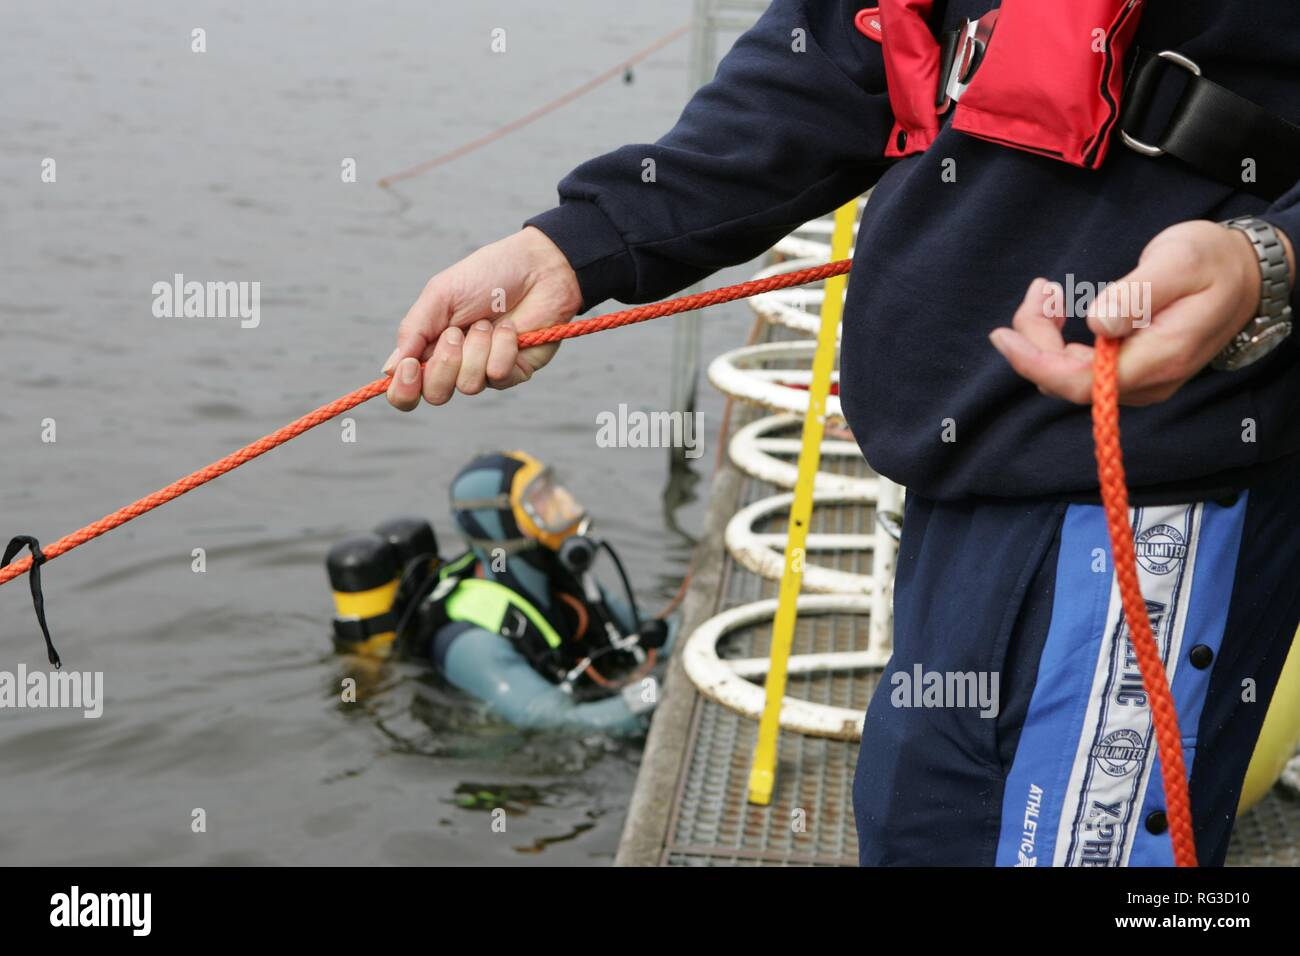 DEU, Federal Republic of Germany, Essen : Rescue diver of a fire brigade at a training. - Stock Image